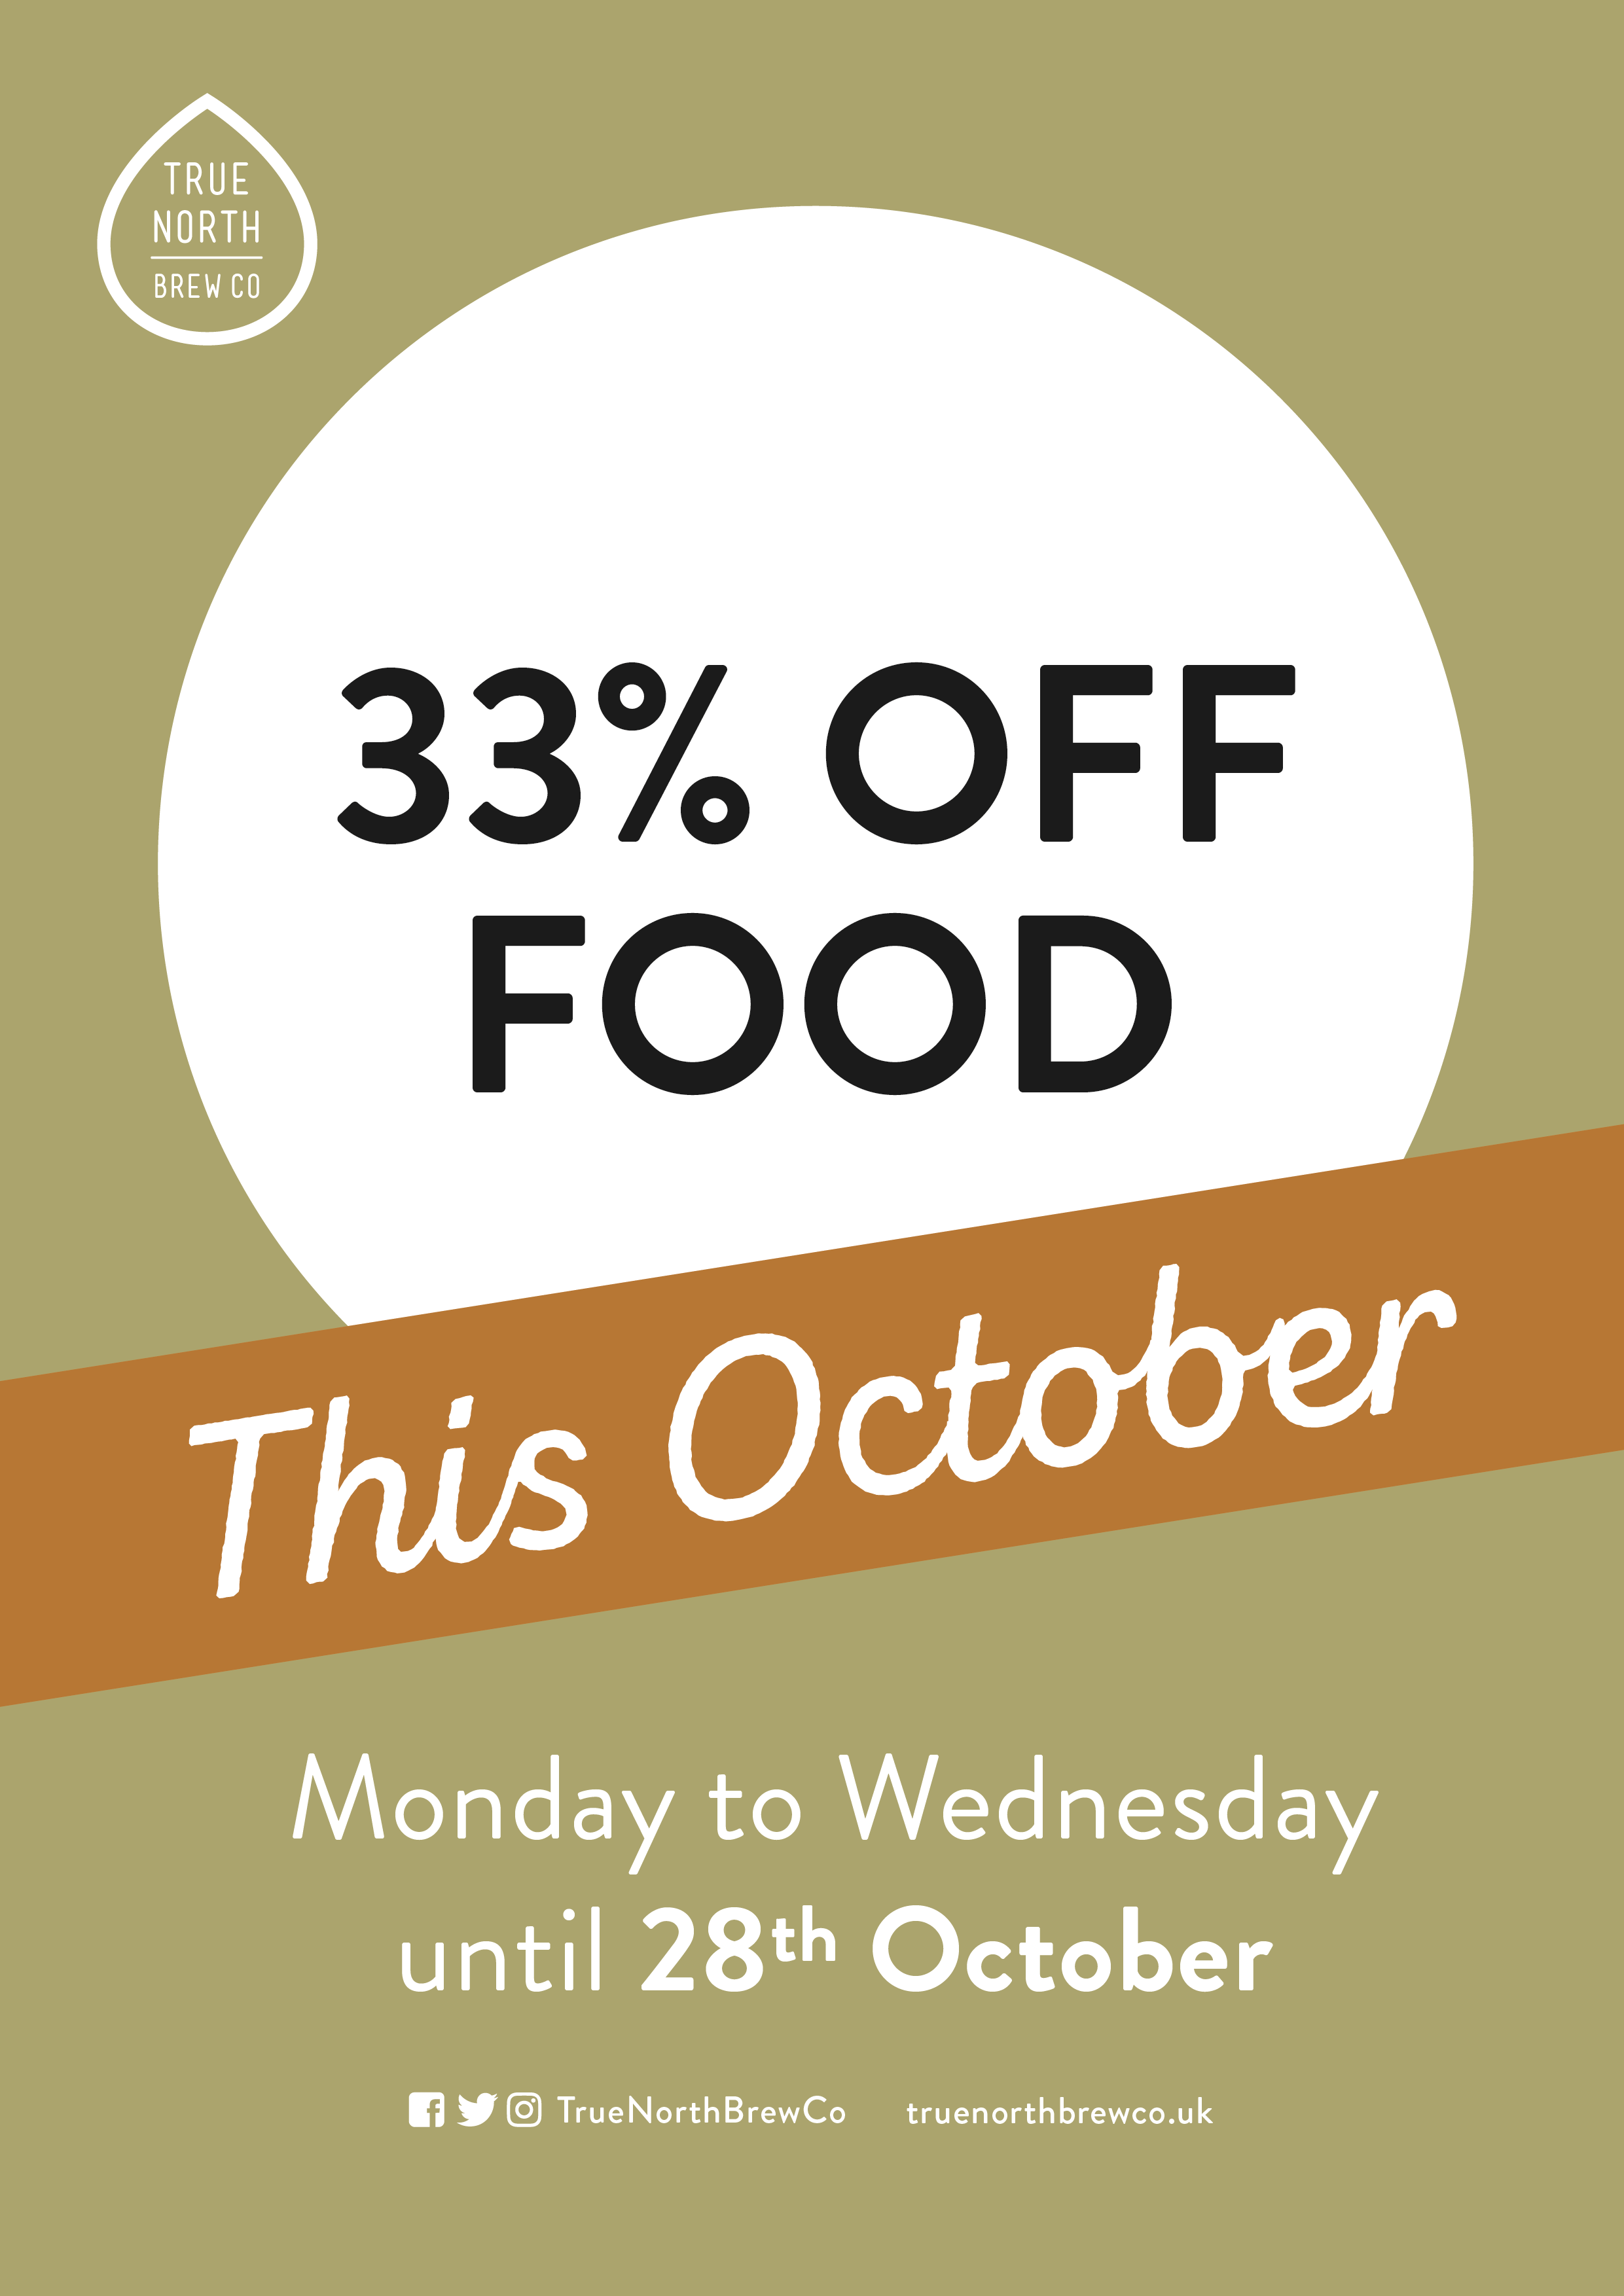 33% OFF FOOD!